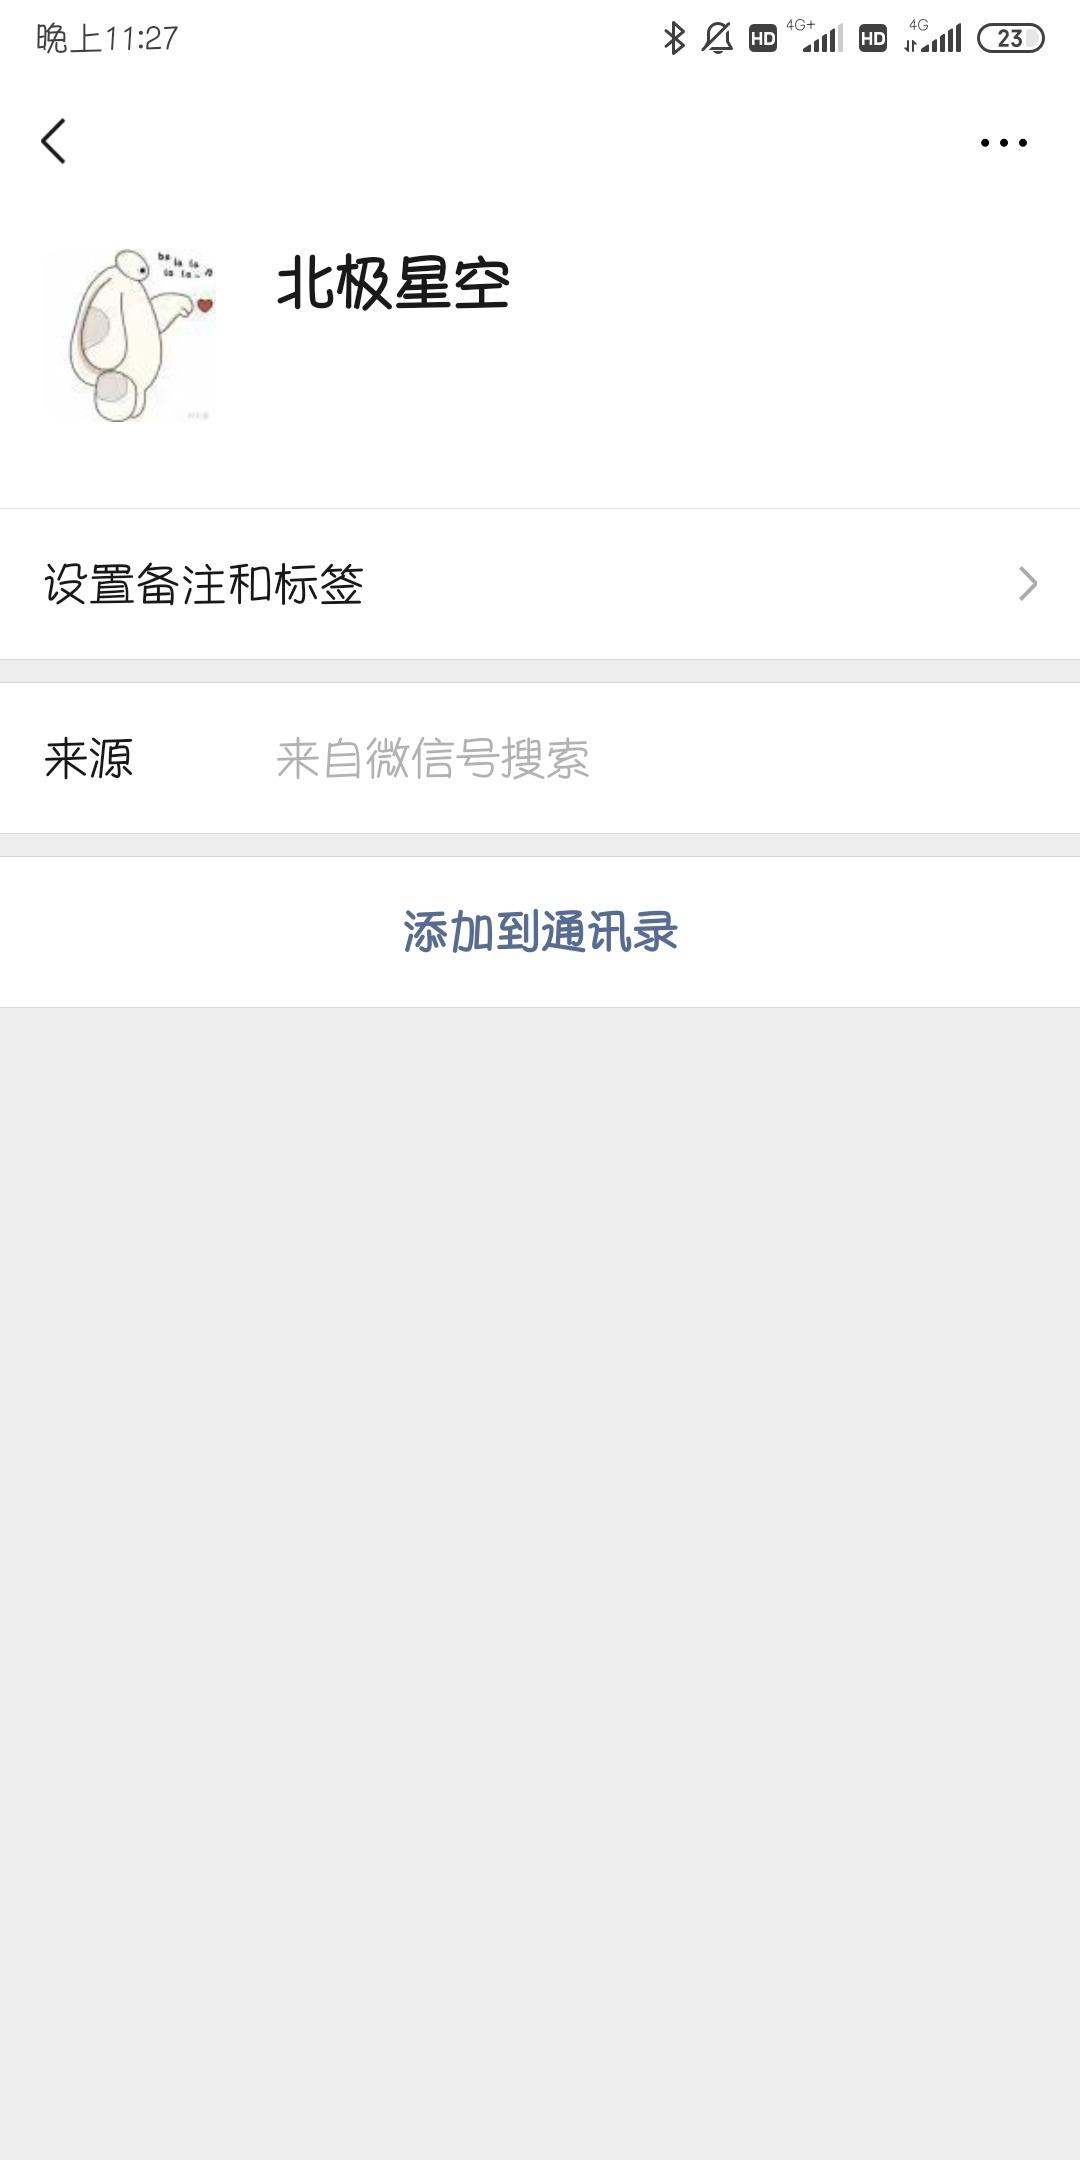 Screenshot_2020-01-10-23-27-38-190_com.tencent.mm.jpg